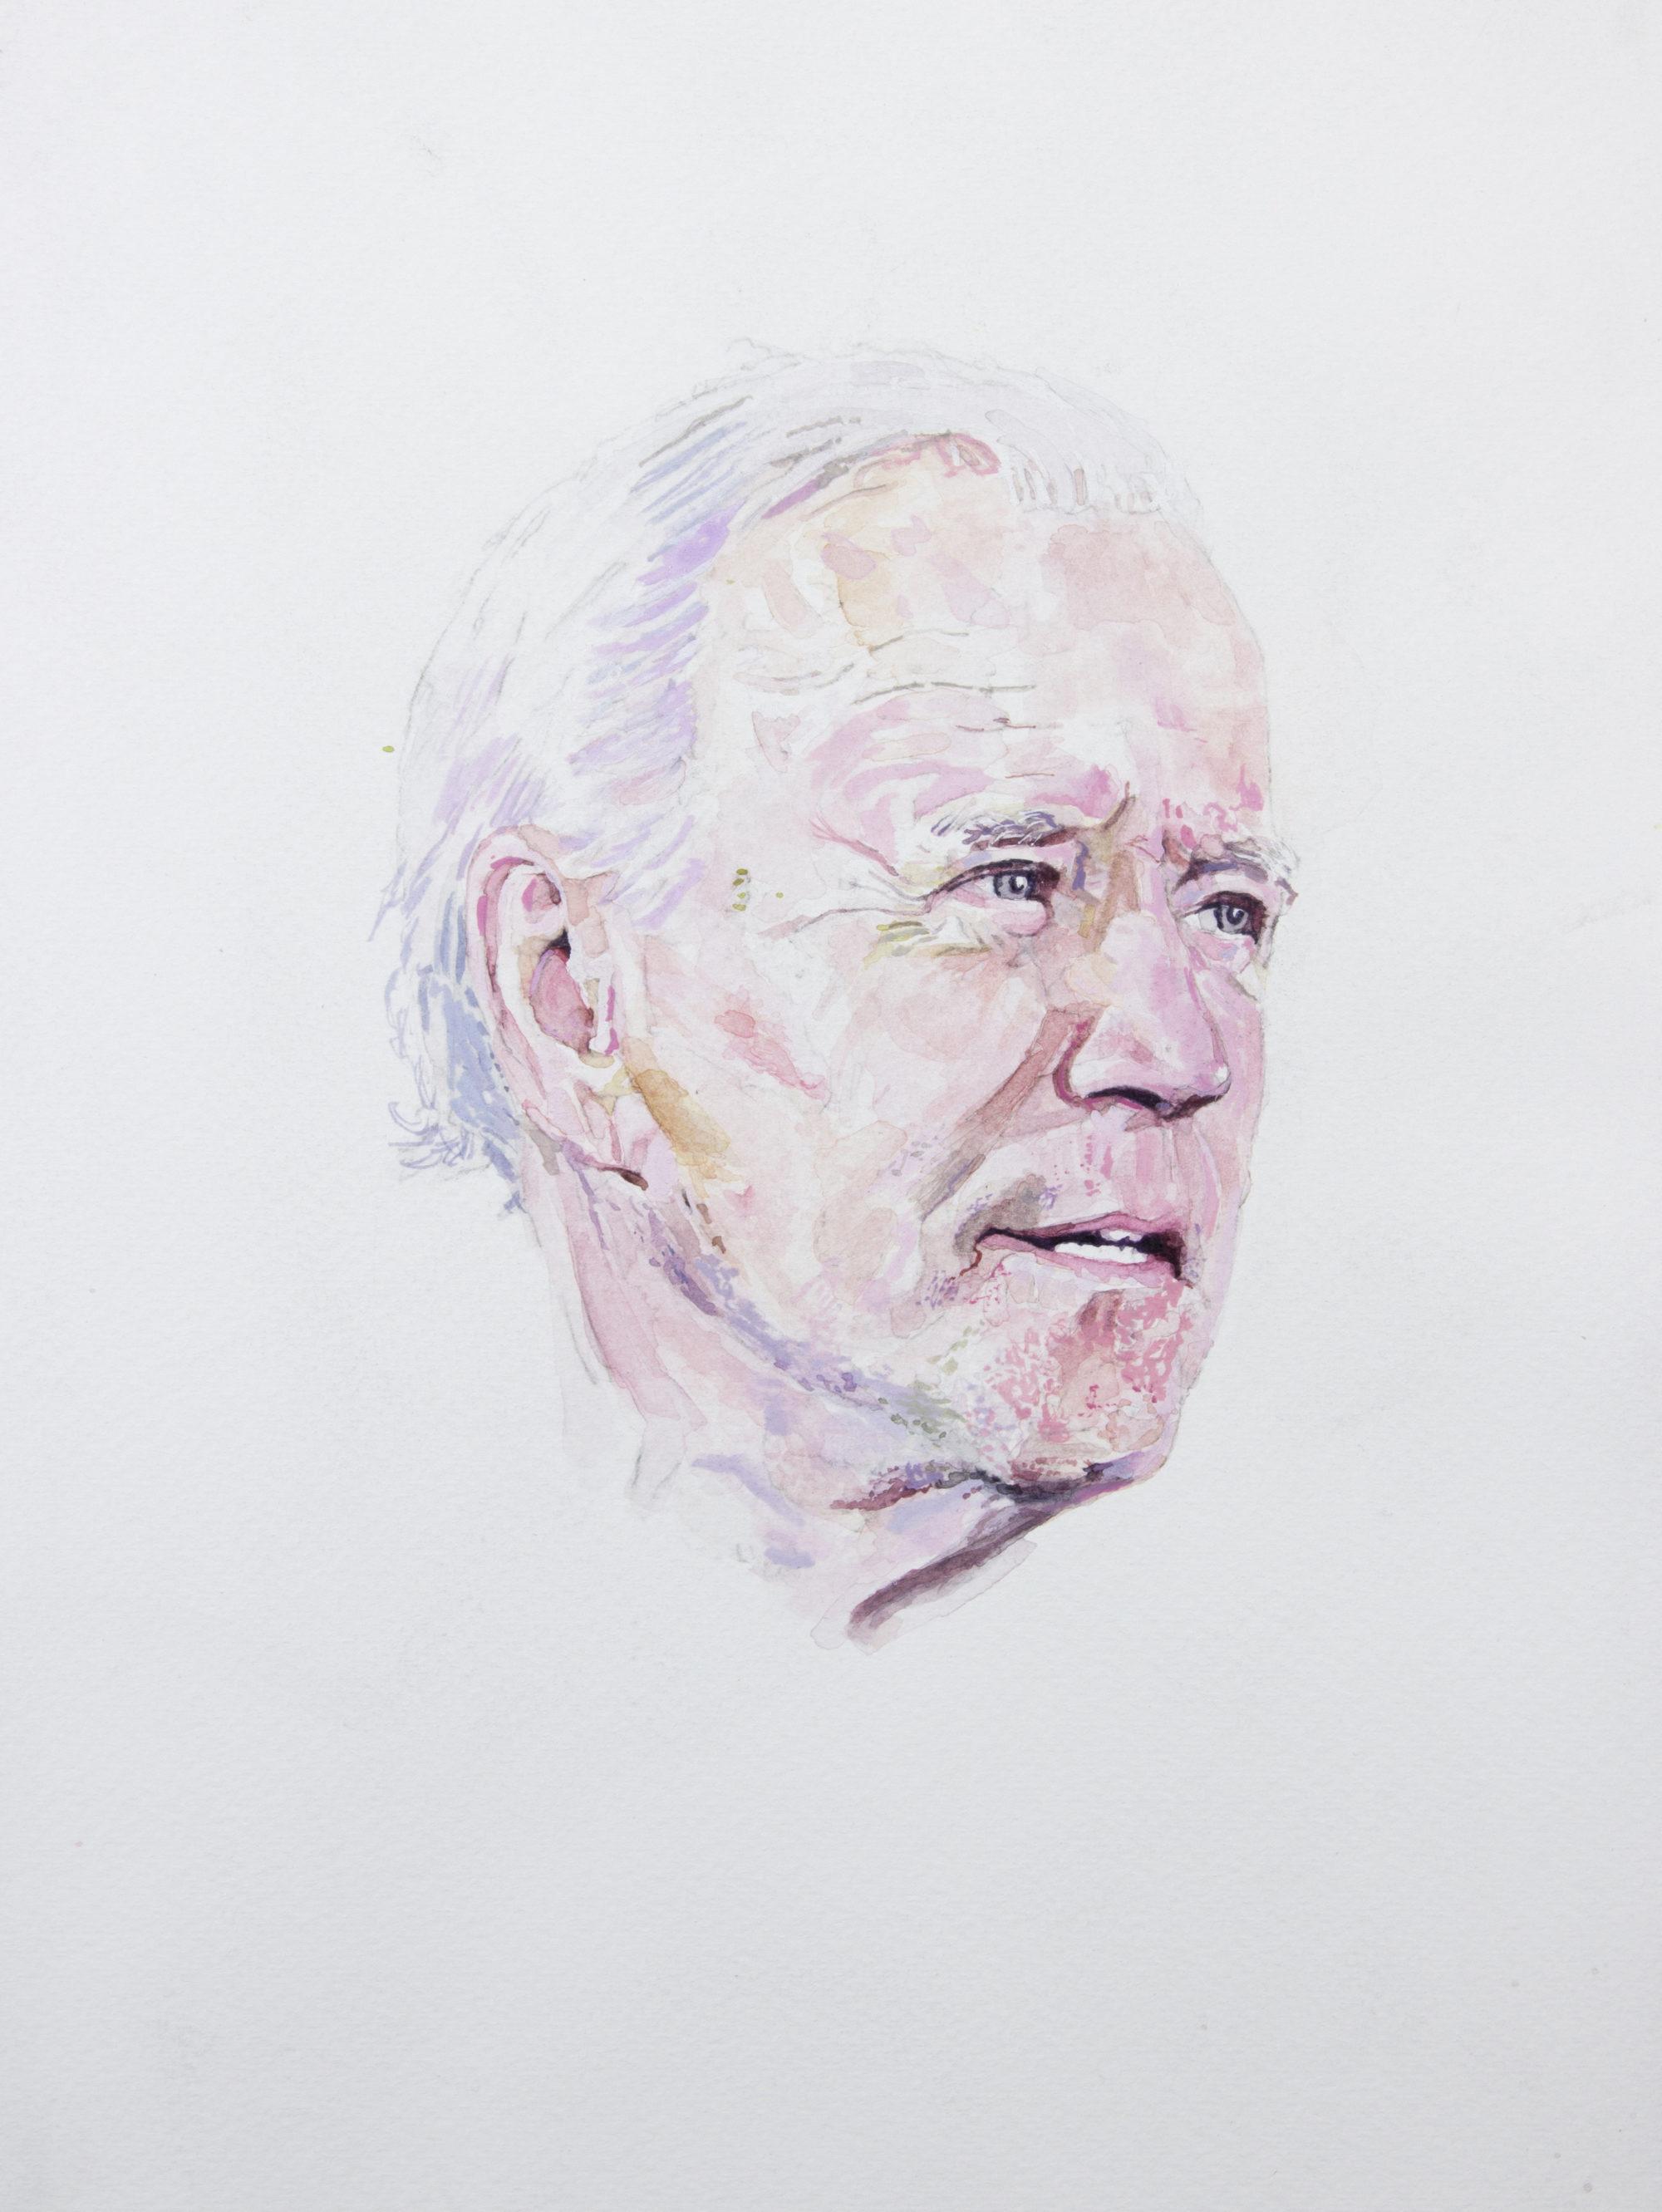 Watercolor portrait of Joe Biden.